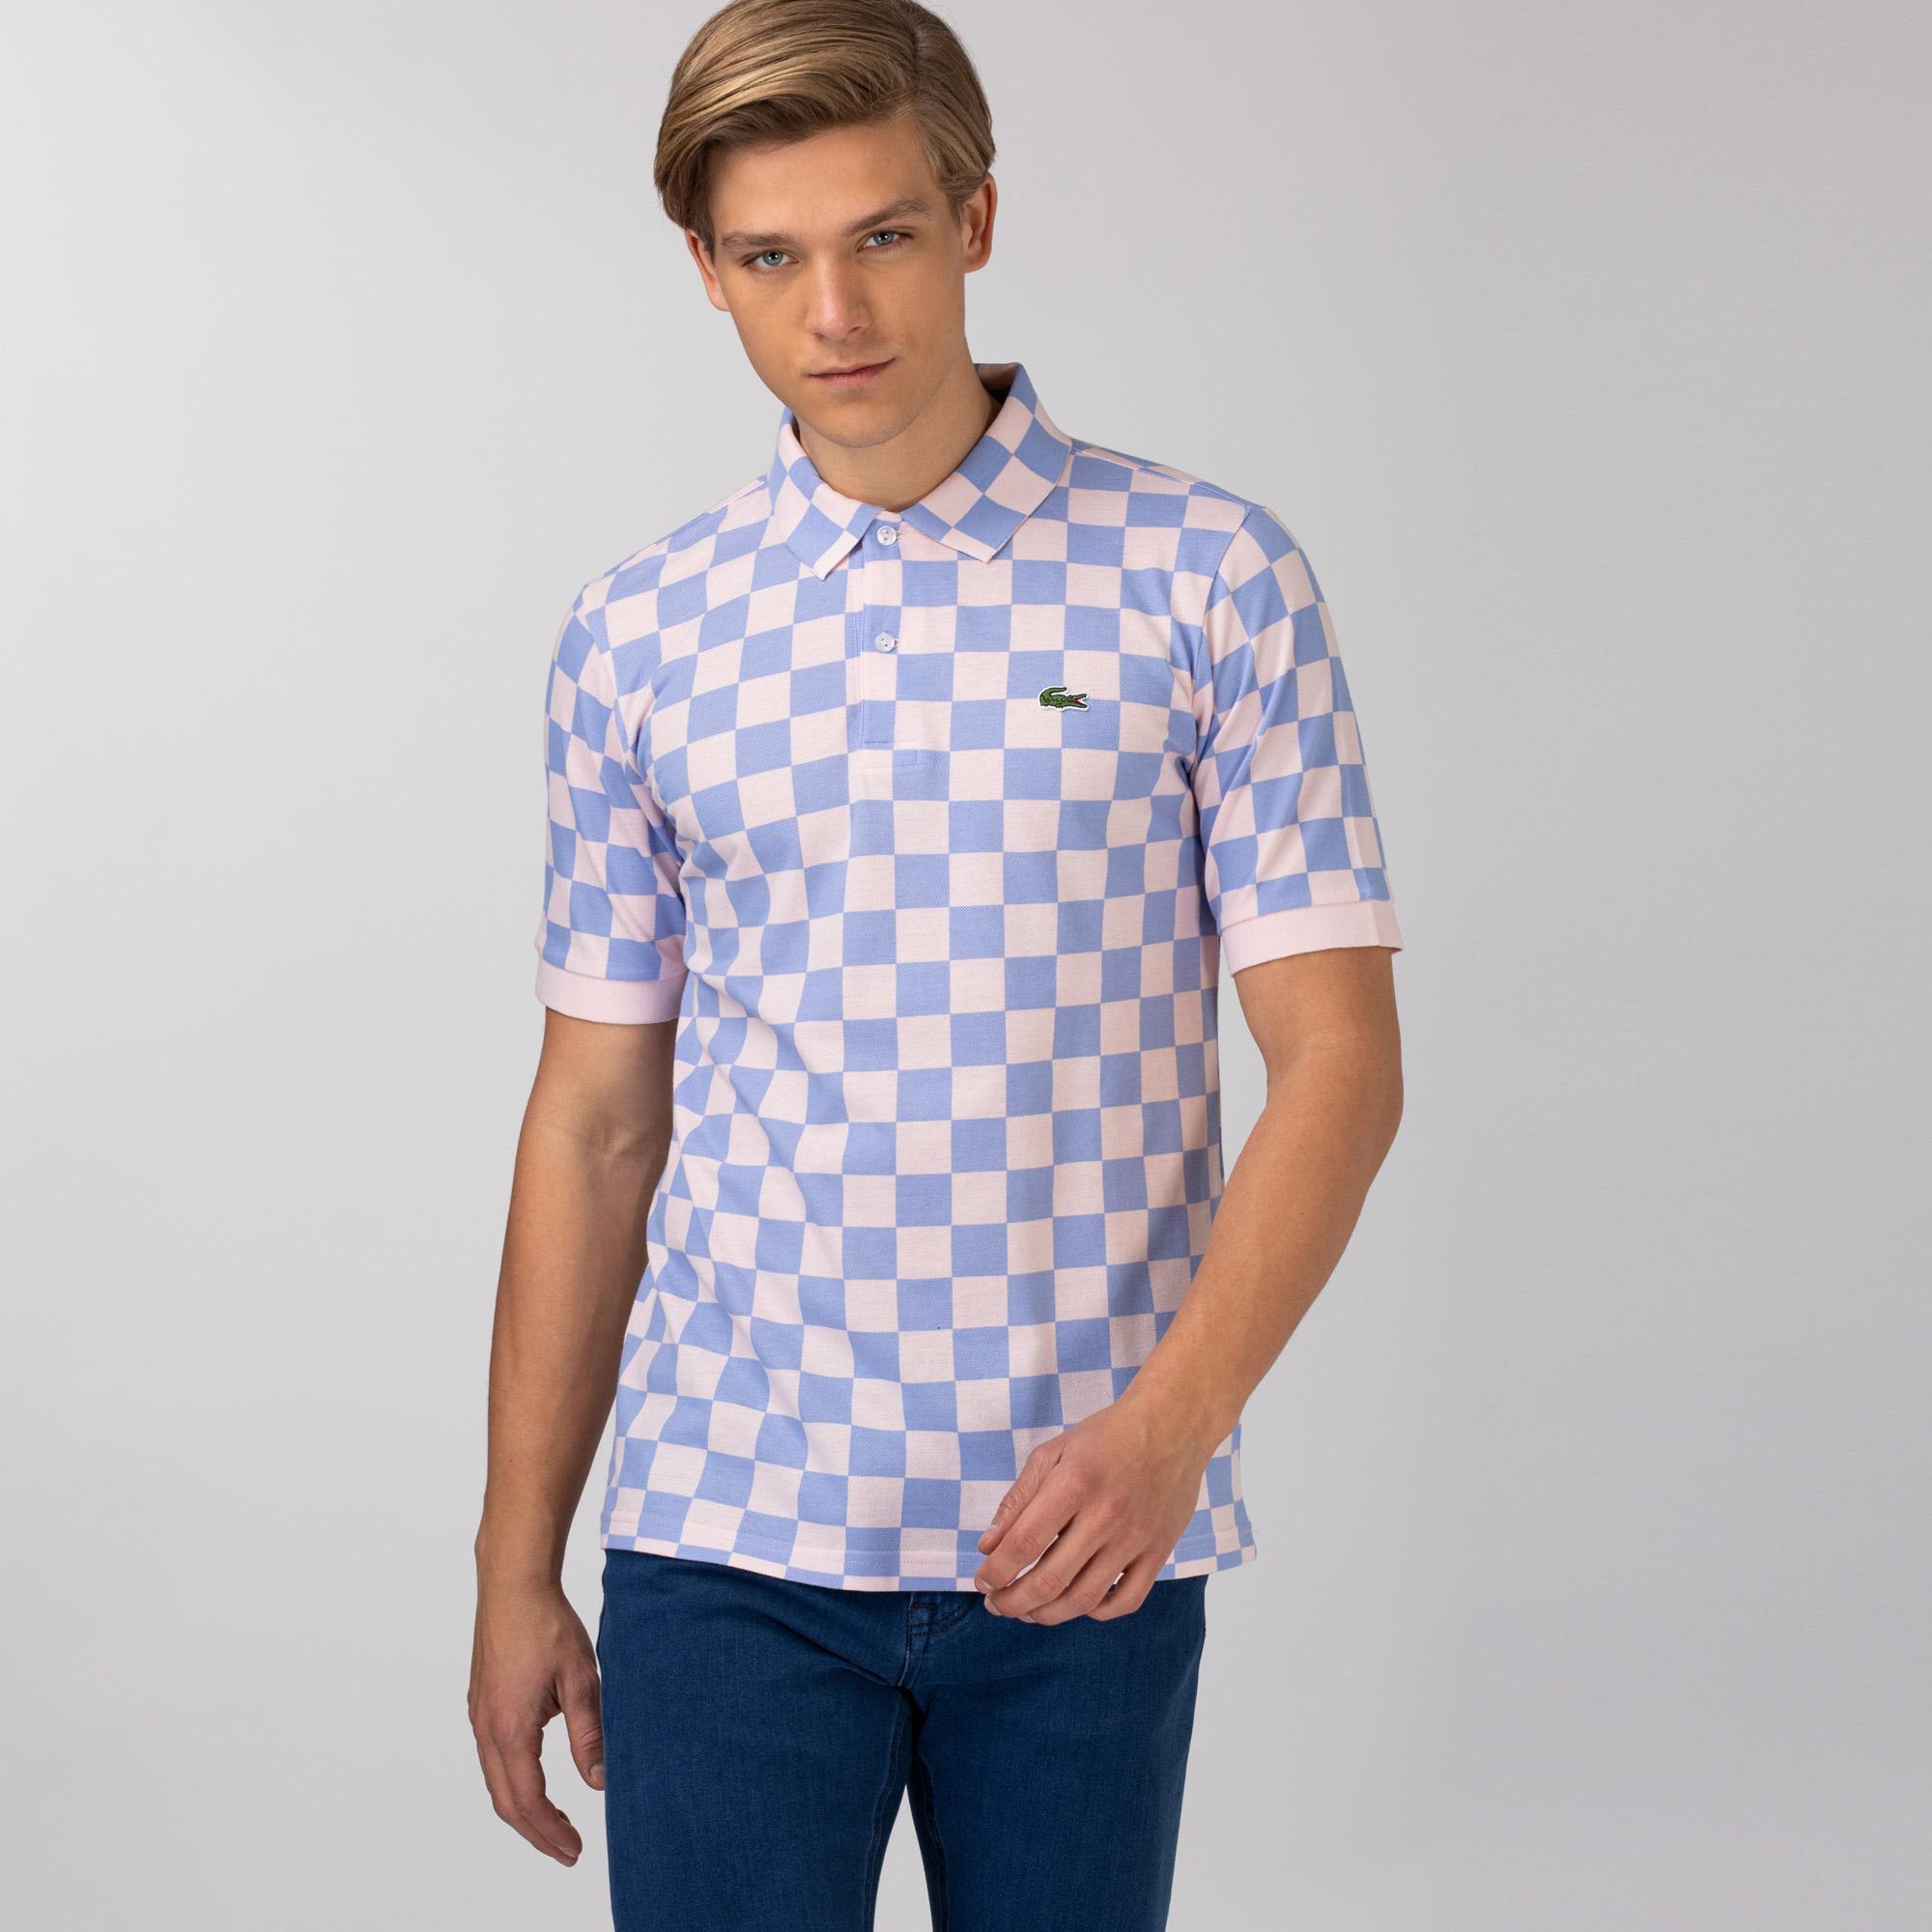 Lacoste Unisex LIVE Checkerboard Print Cotton Piqué Polo Shirt